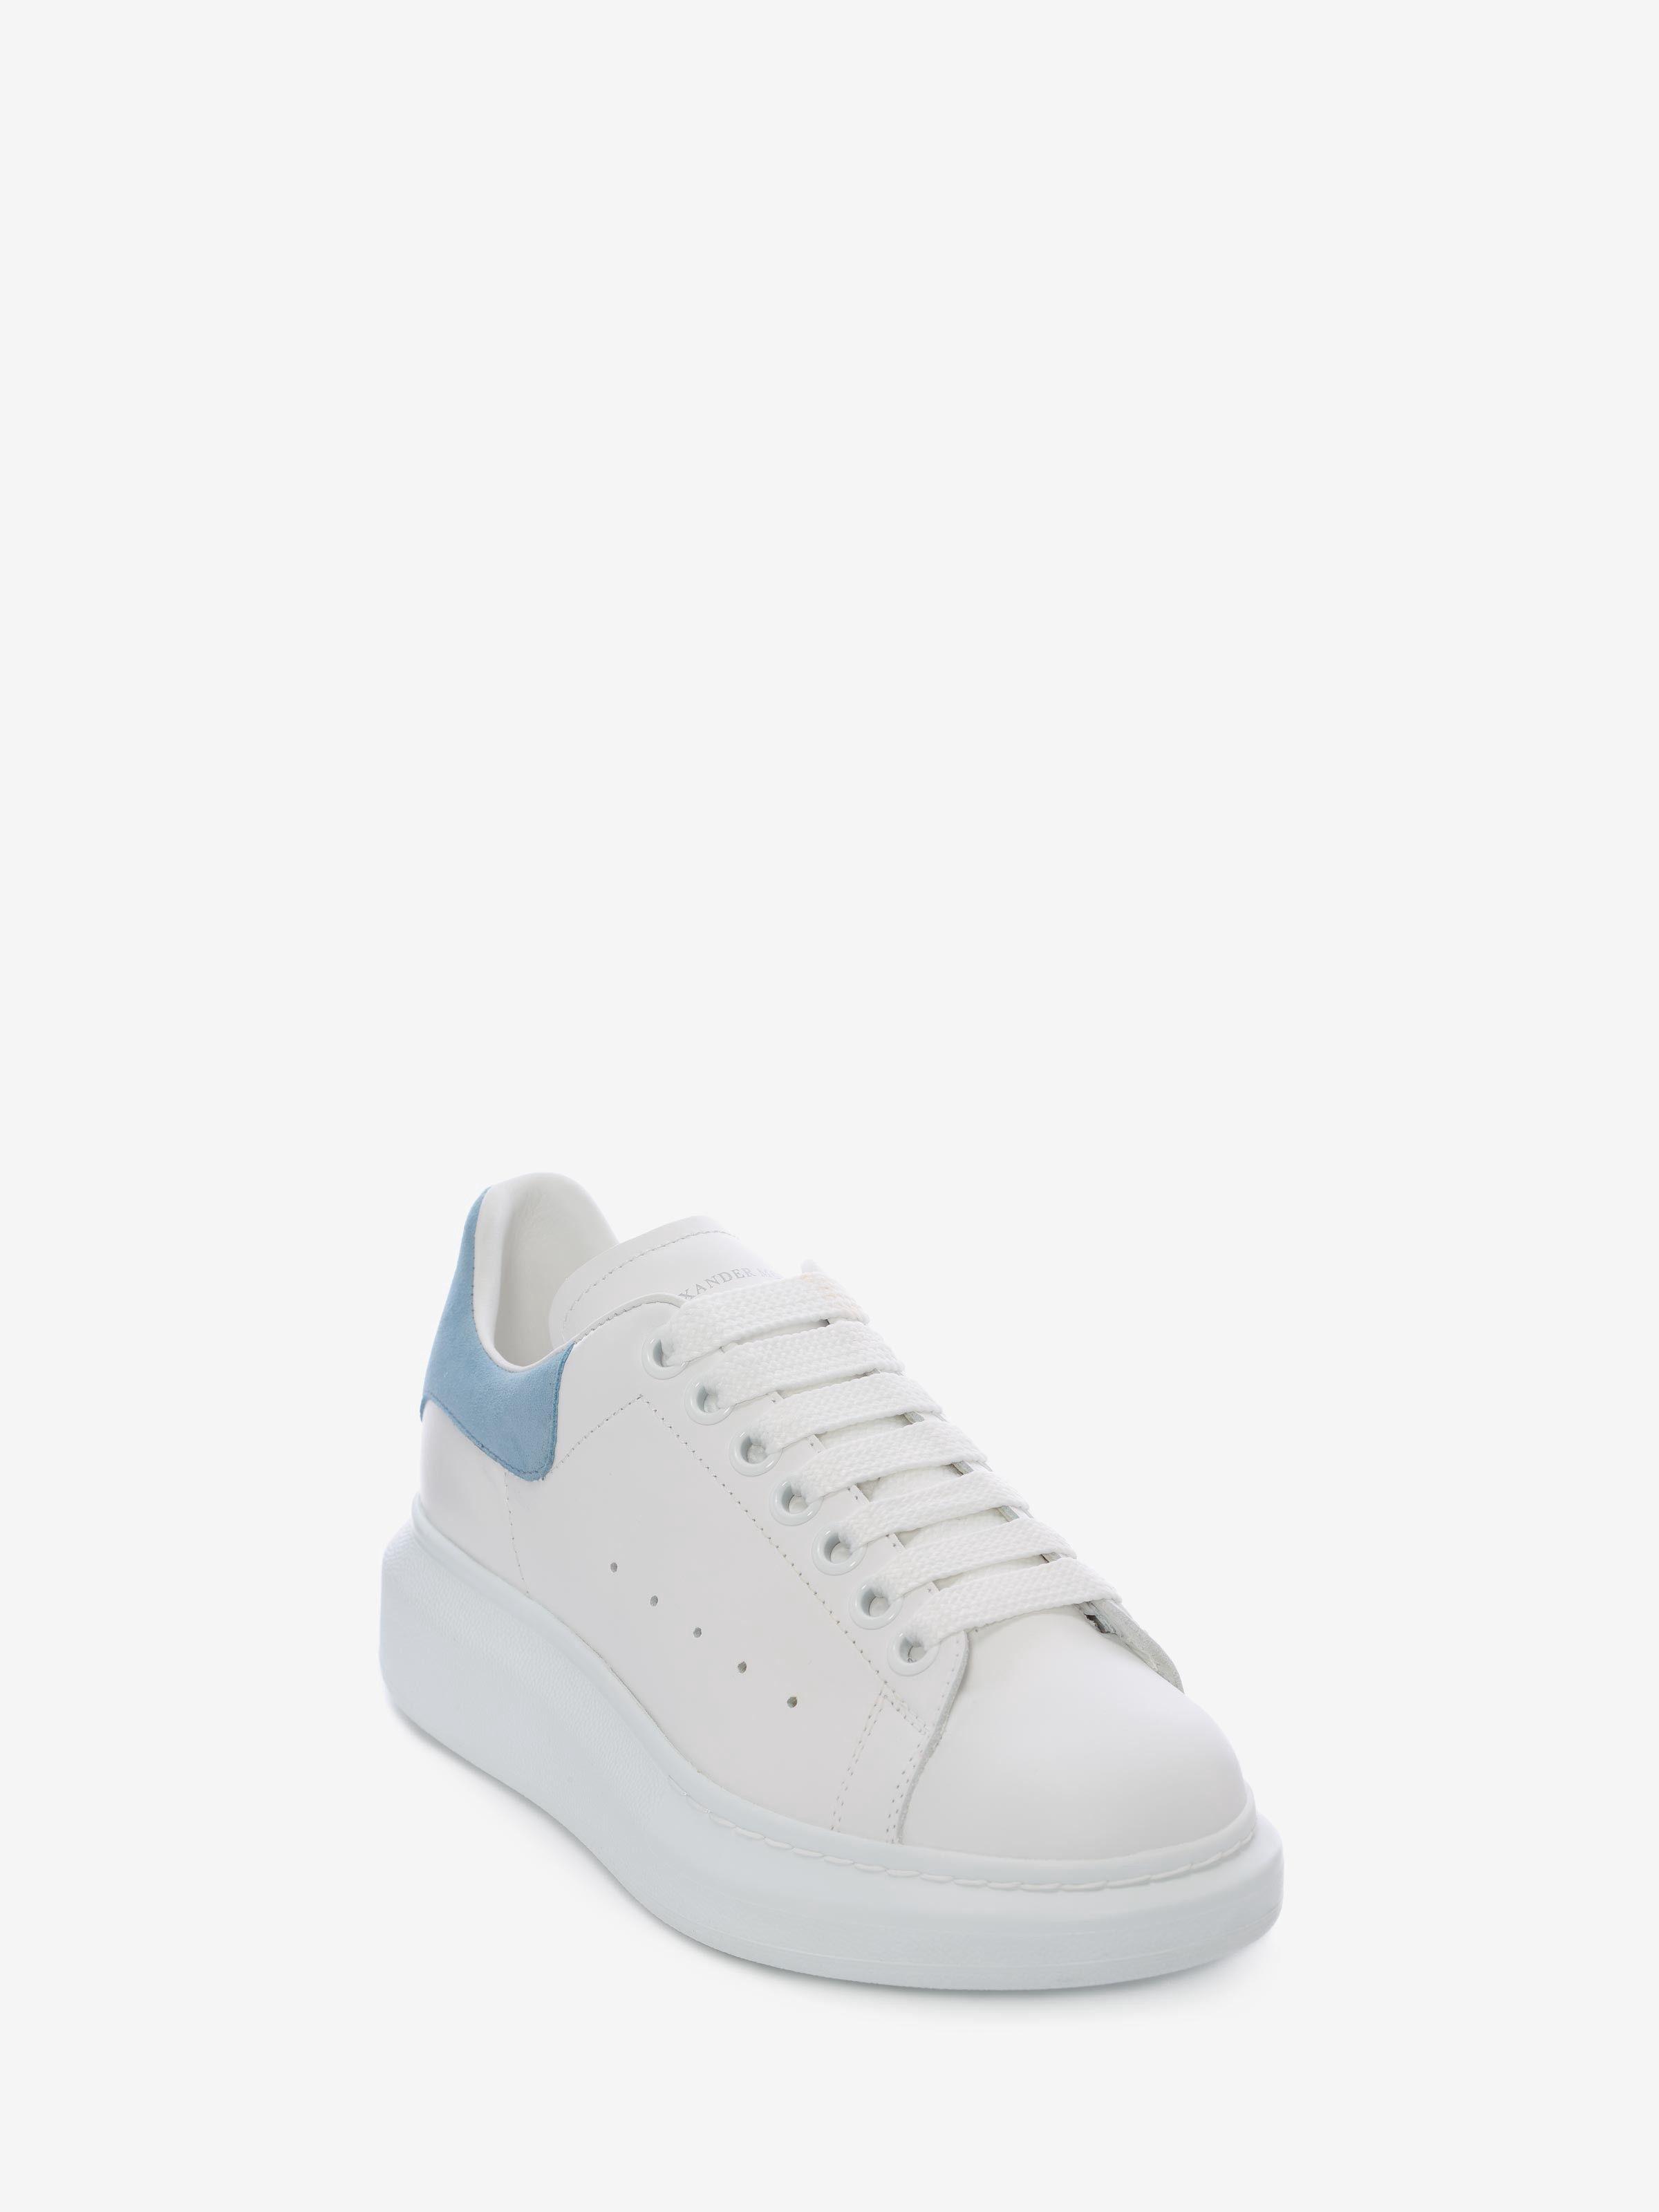 Alexander Oversized 5 Sneaker Mcqueen Indigo Light BlueAnns 39 f7g6vIYby